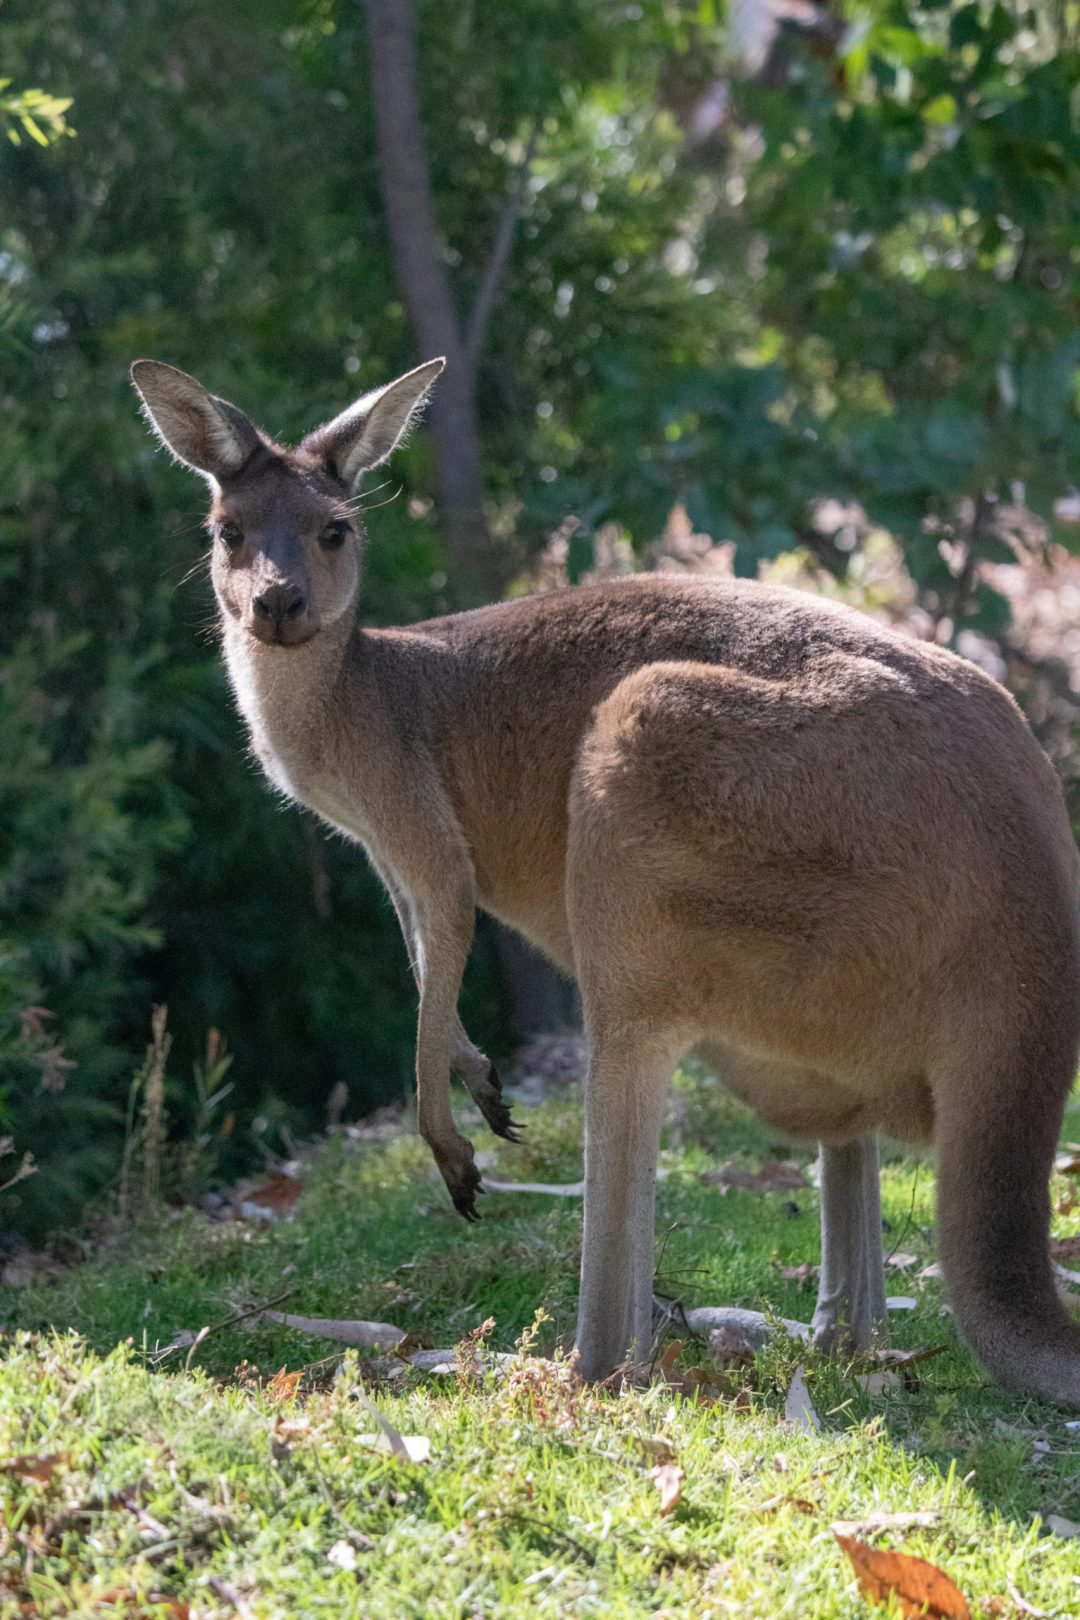 kangaroo crouches in park